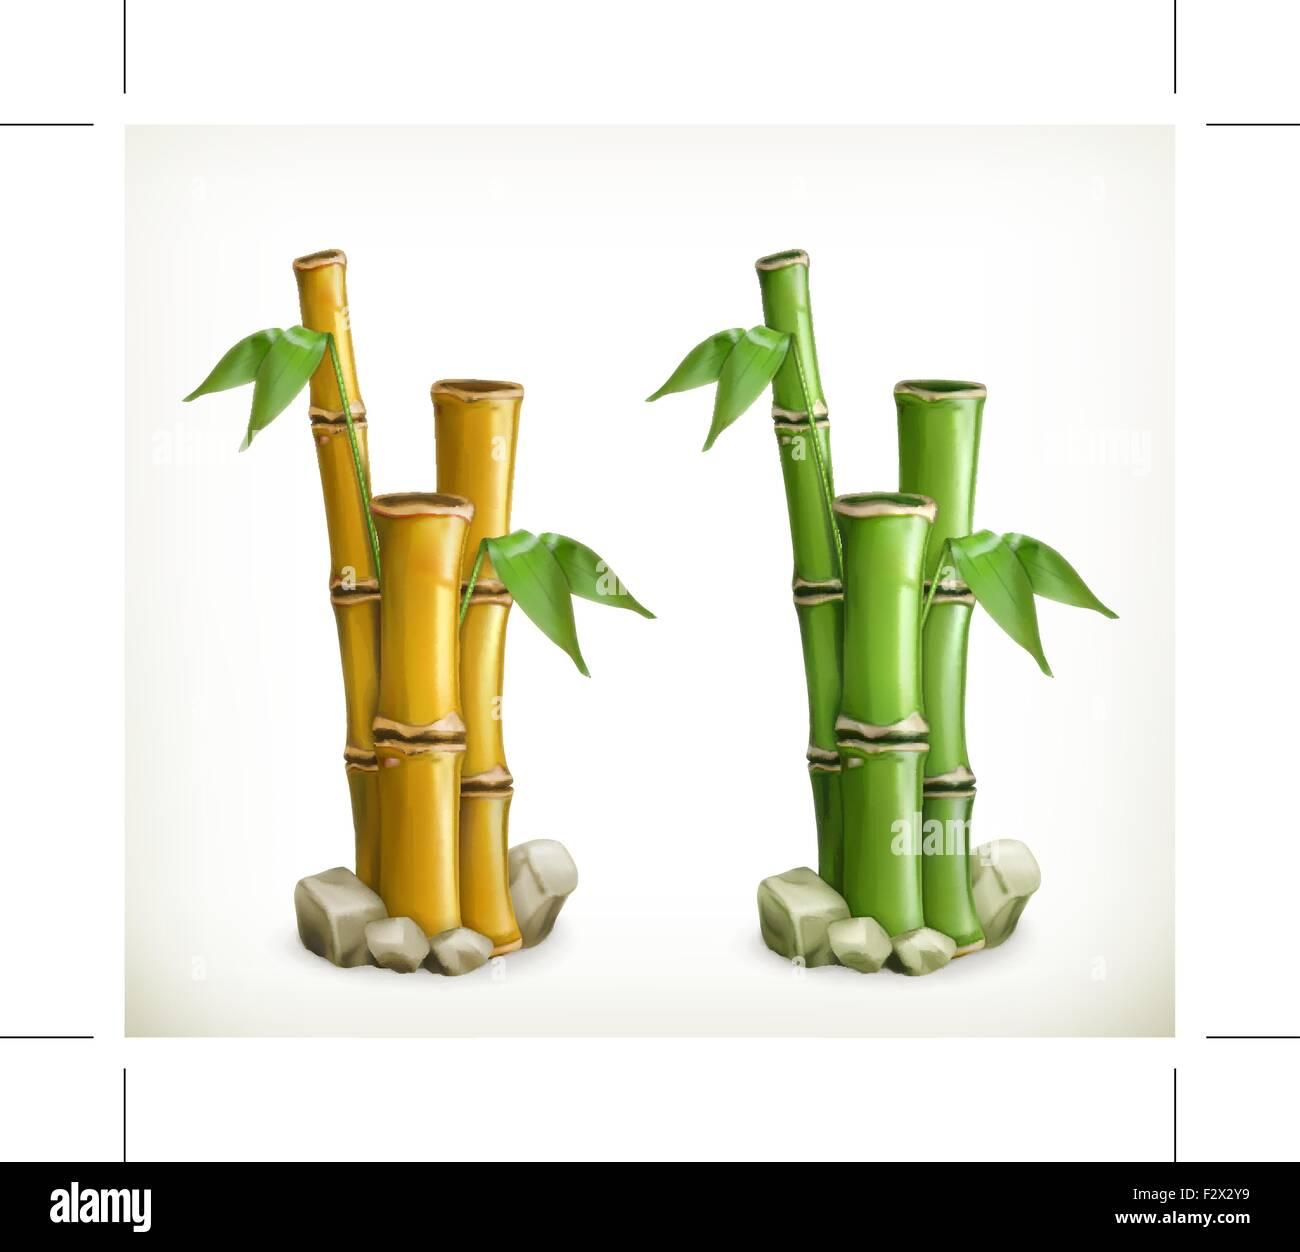 Bambus Vektor Icon Vektor Abbildung Bild 87854237 Alamy